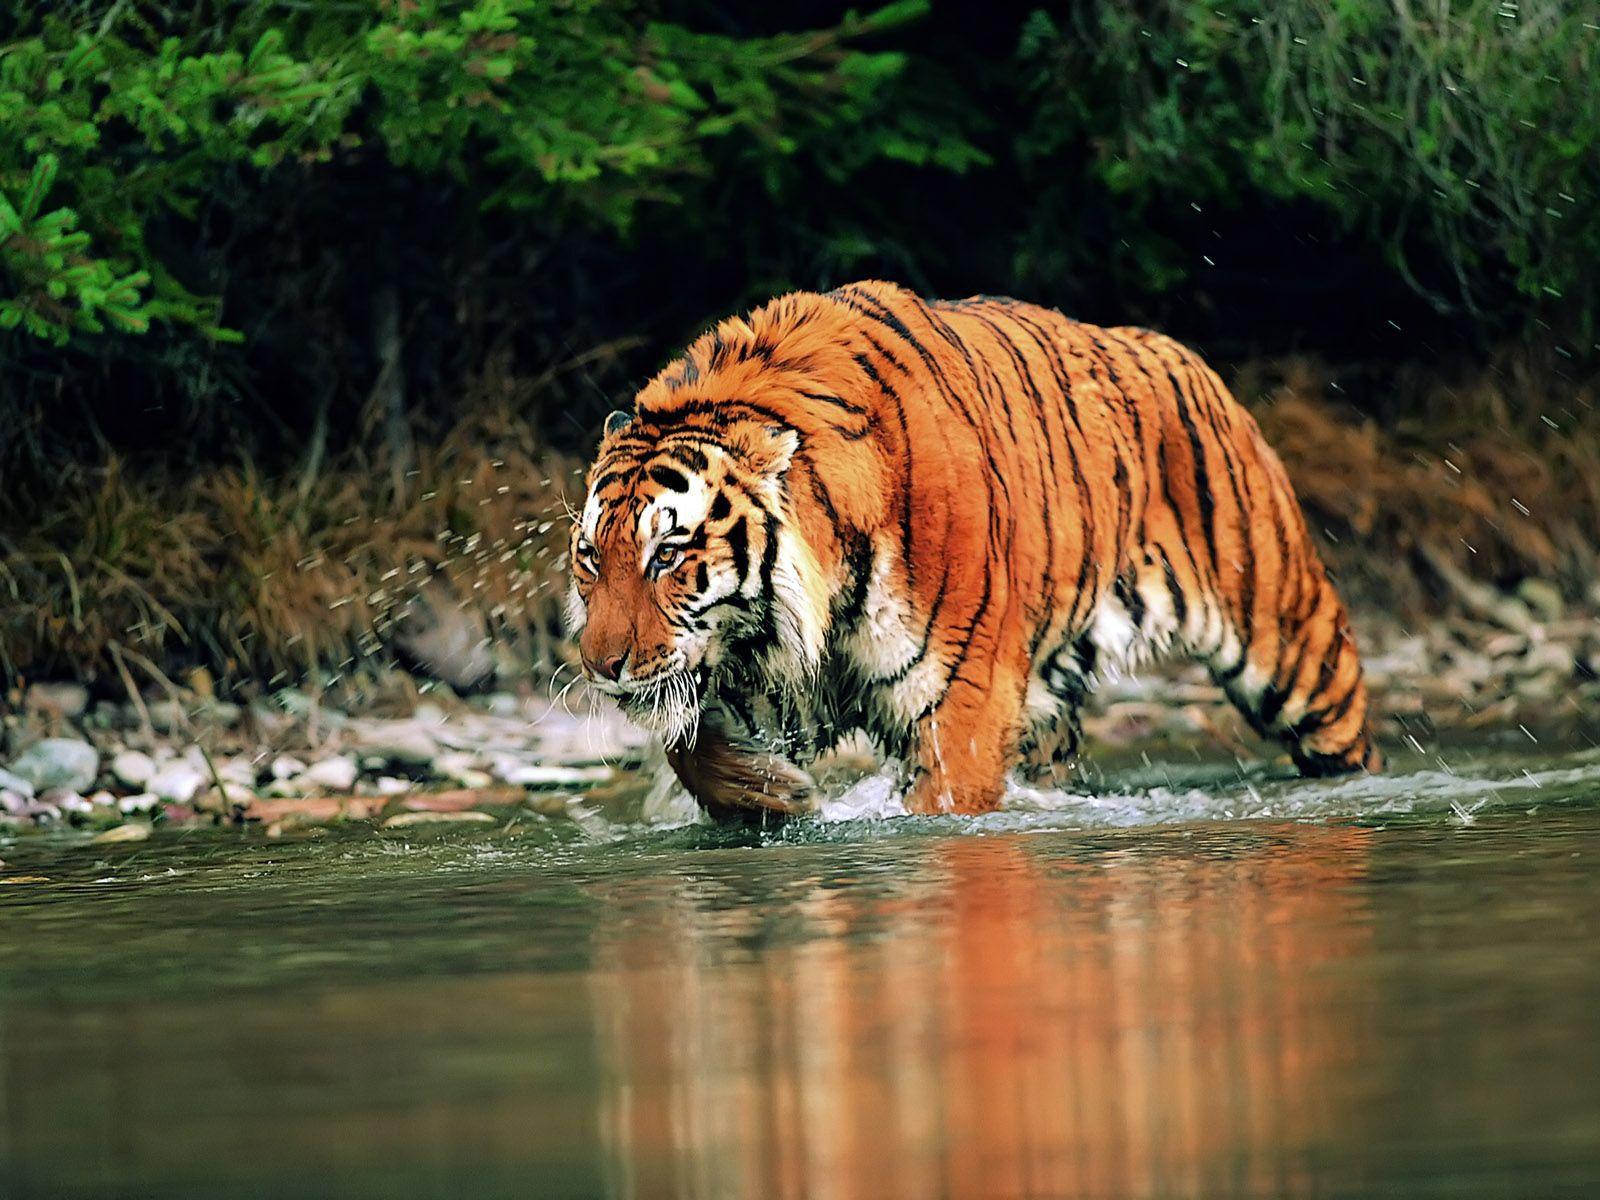 tiger wallpapers white desktop | hd wallpapers | pinterest | tiger